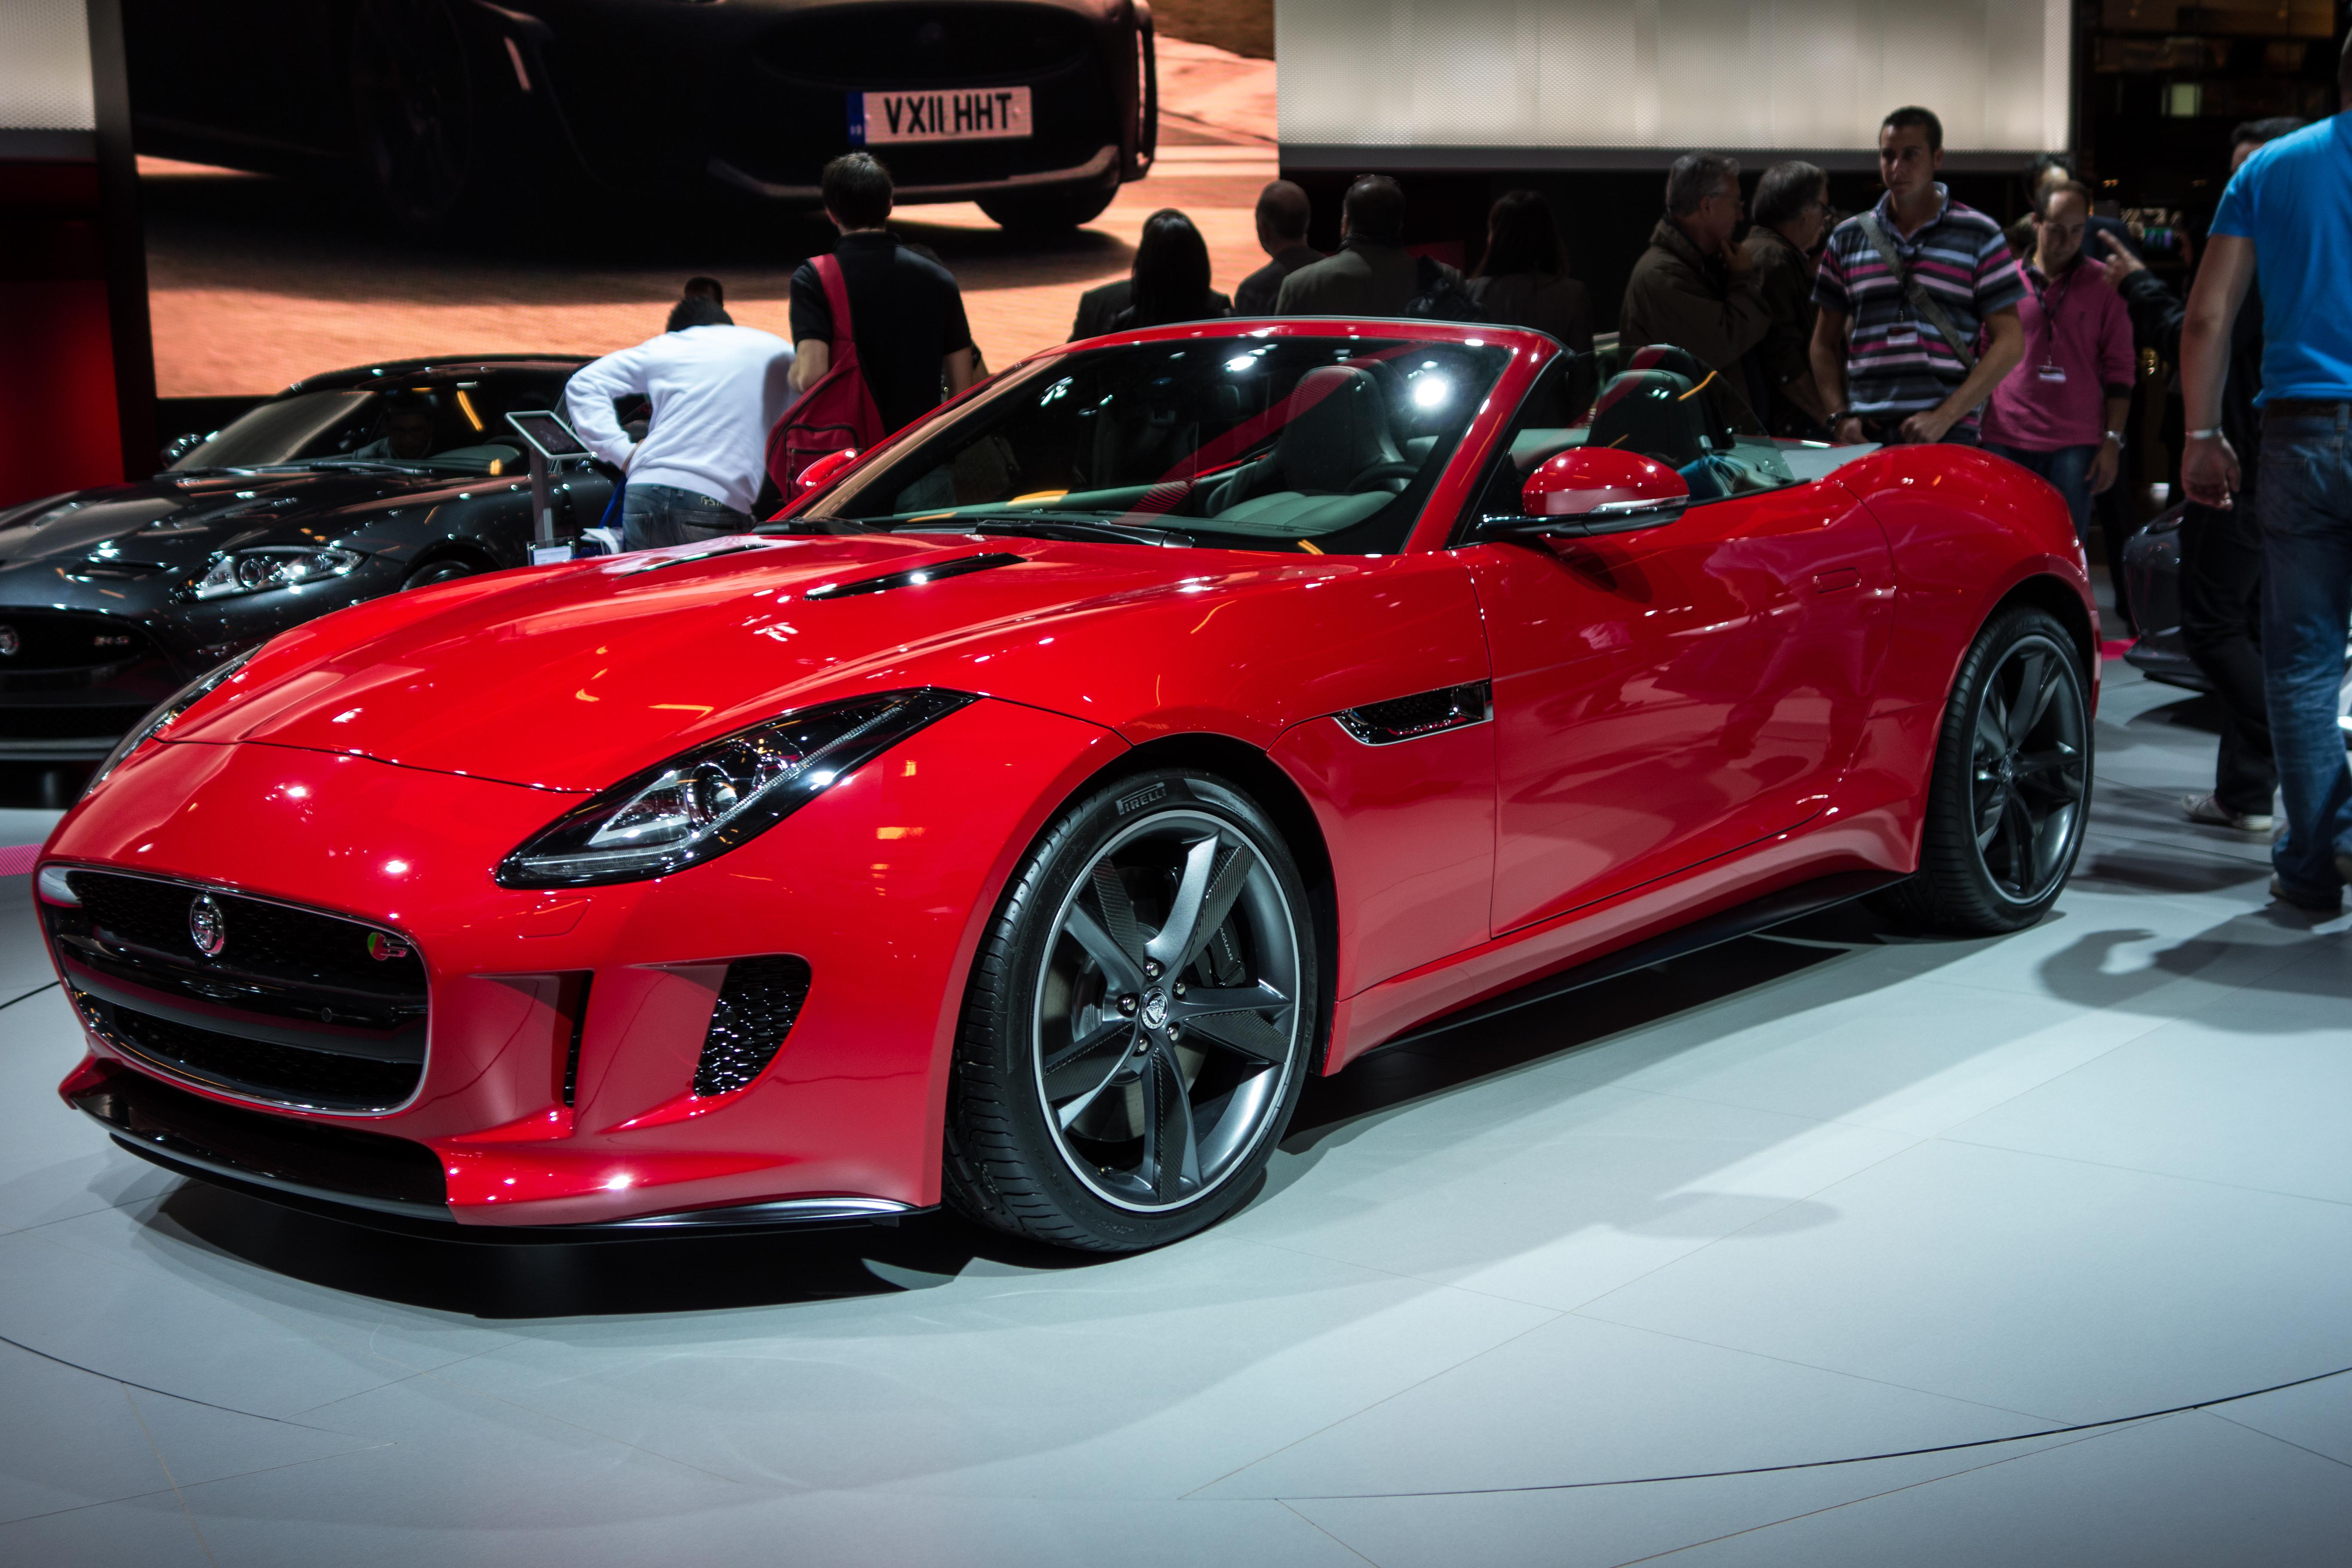 in rapids mi grand a htm car jaguar michigan ultimateblackmetallic dealer jaguars used angularfront